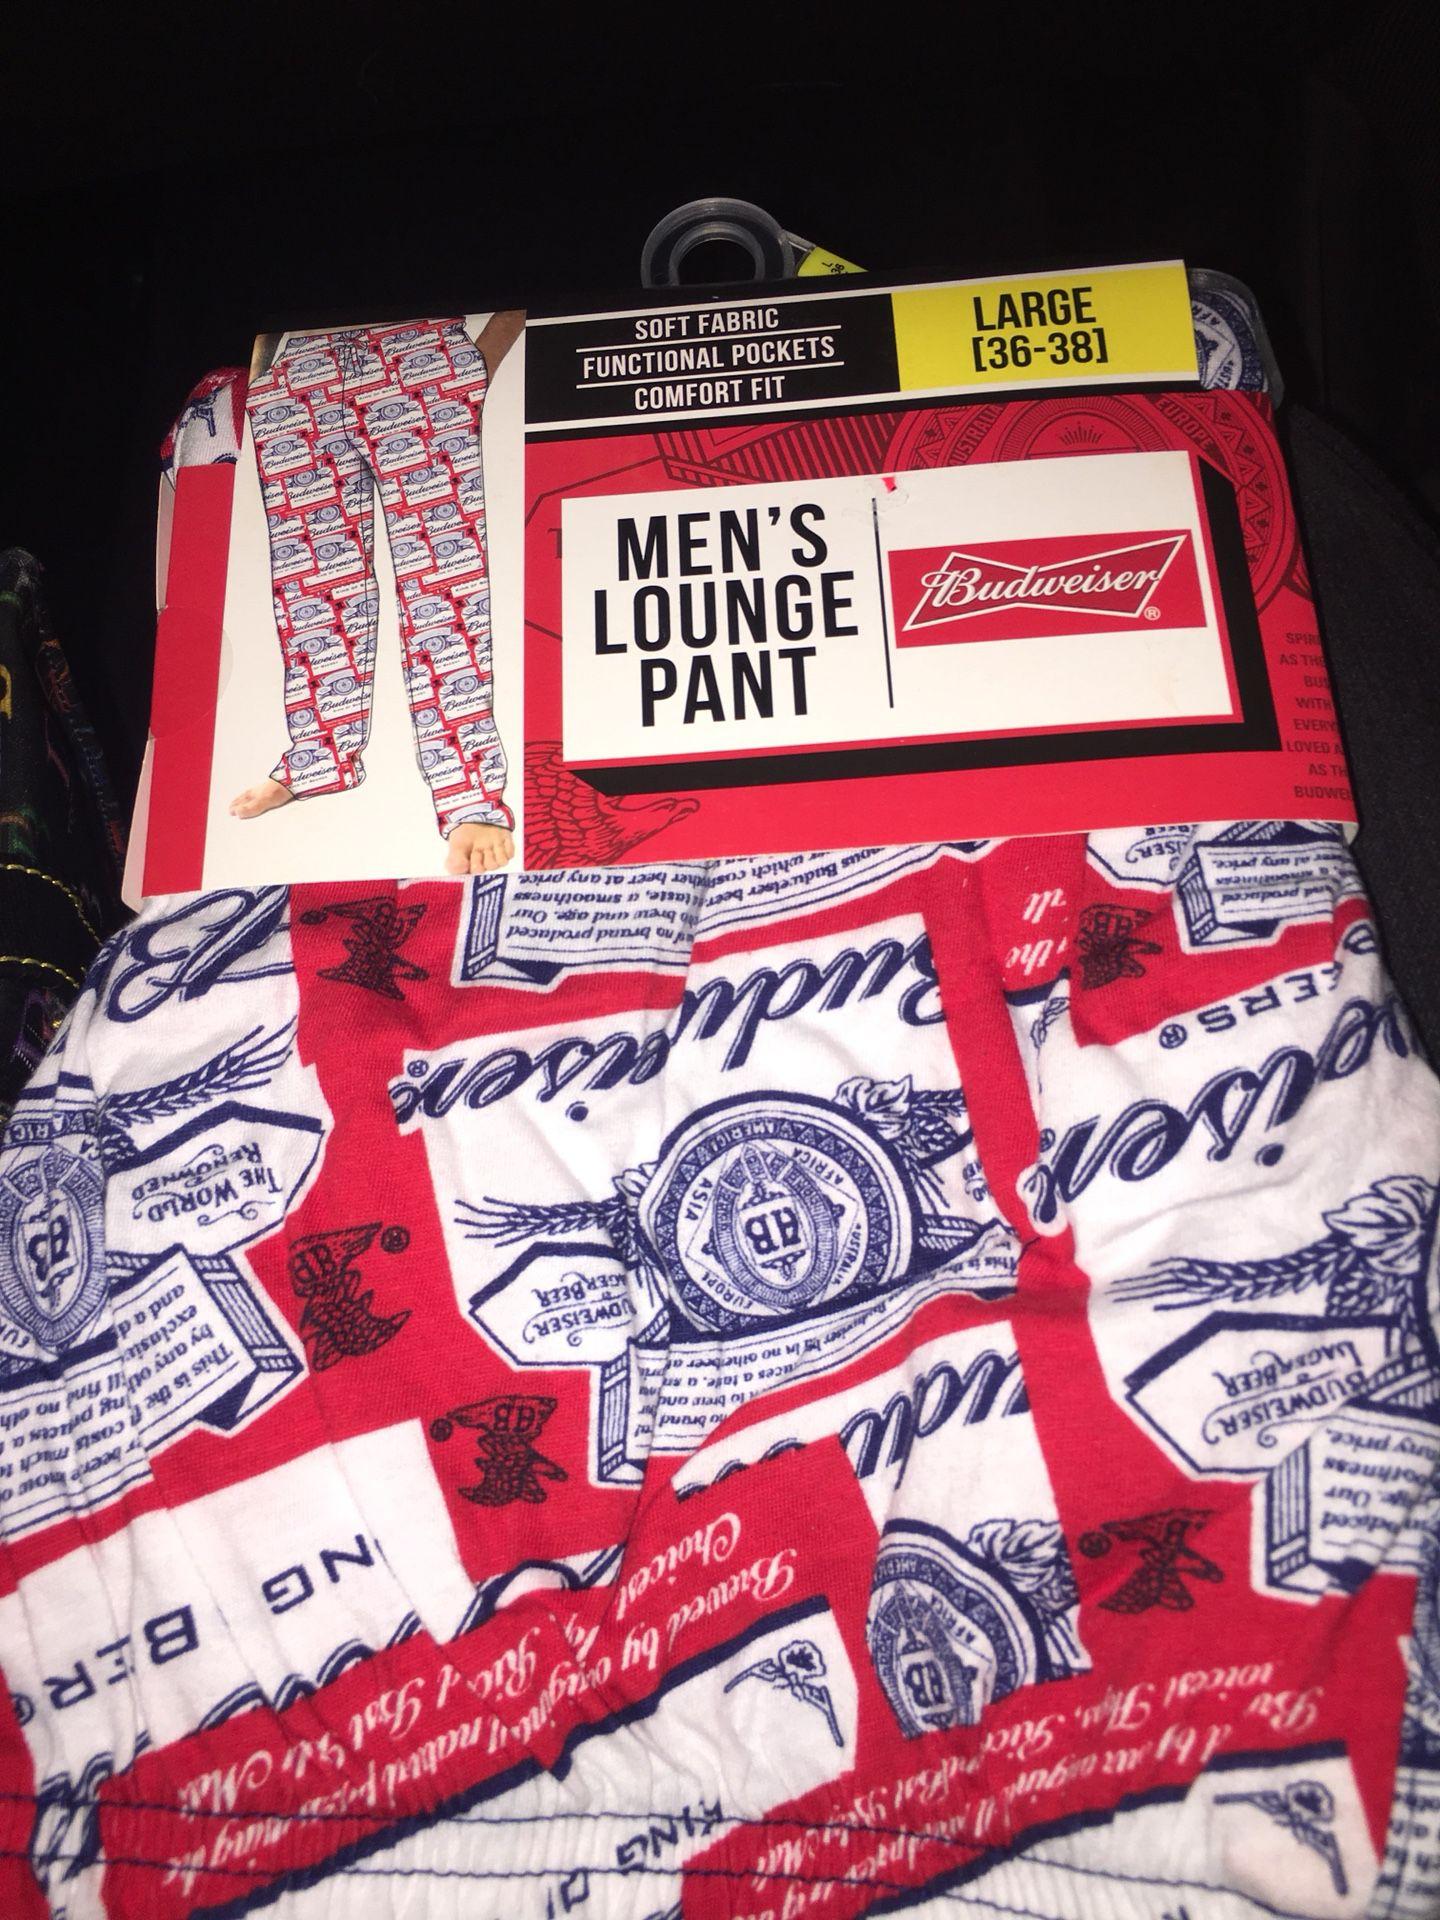 Budweiser sleep pants brand new! 10.00 price is firm!!!! Puo Fontana size L -***